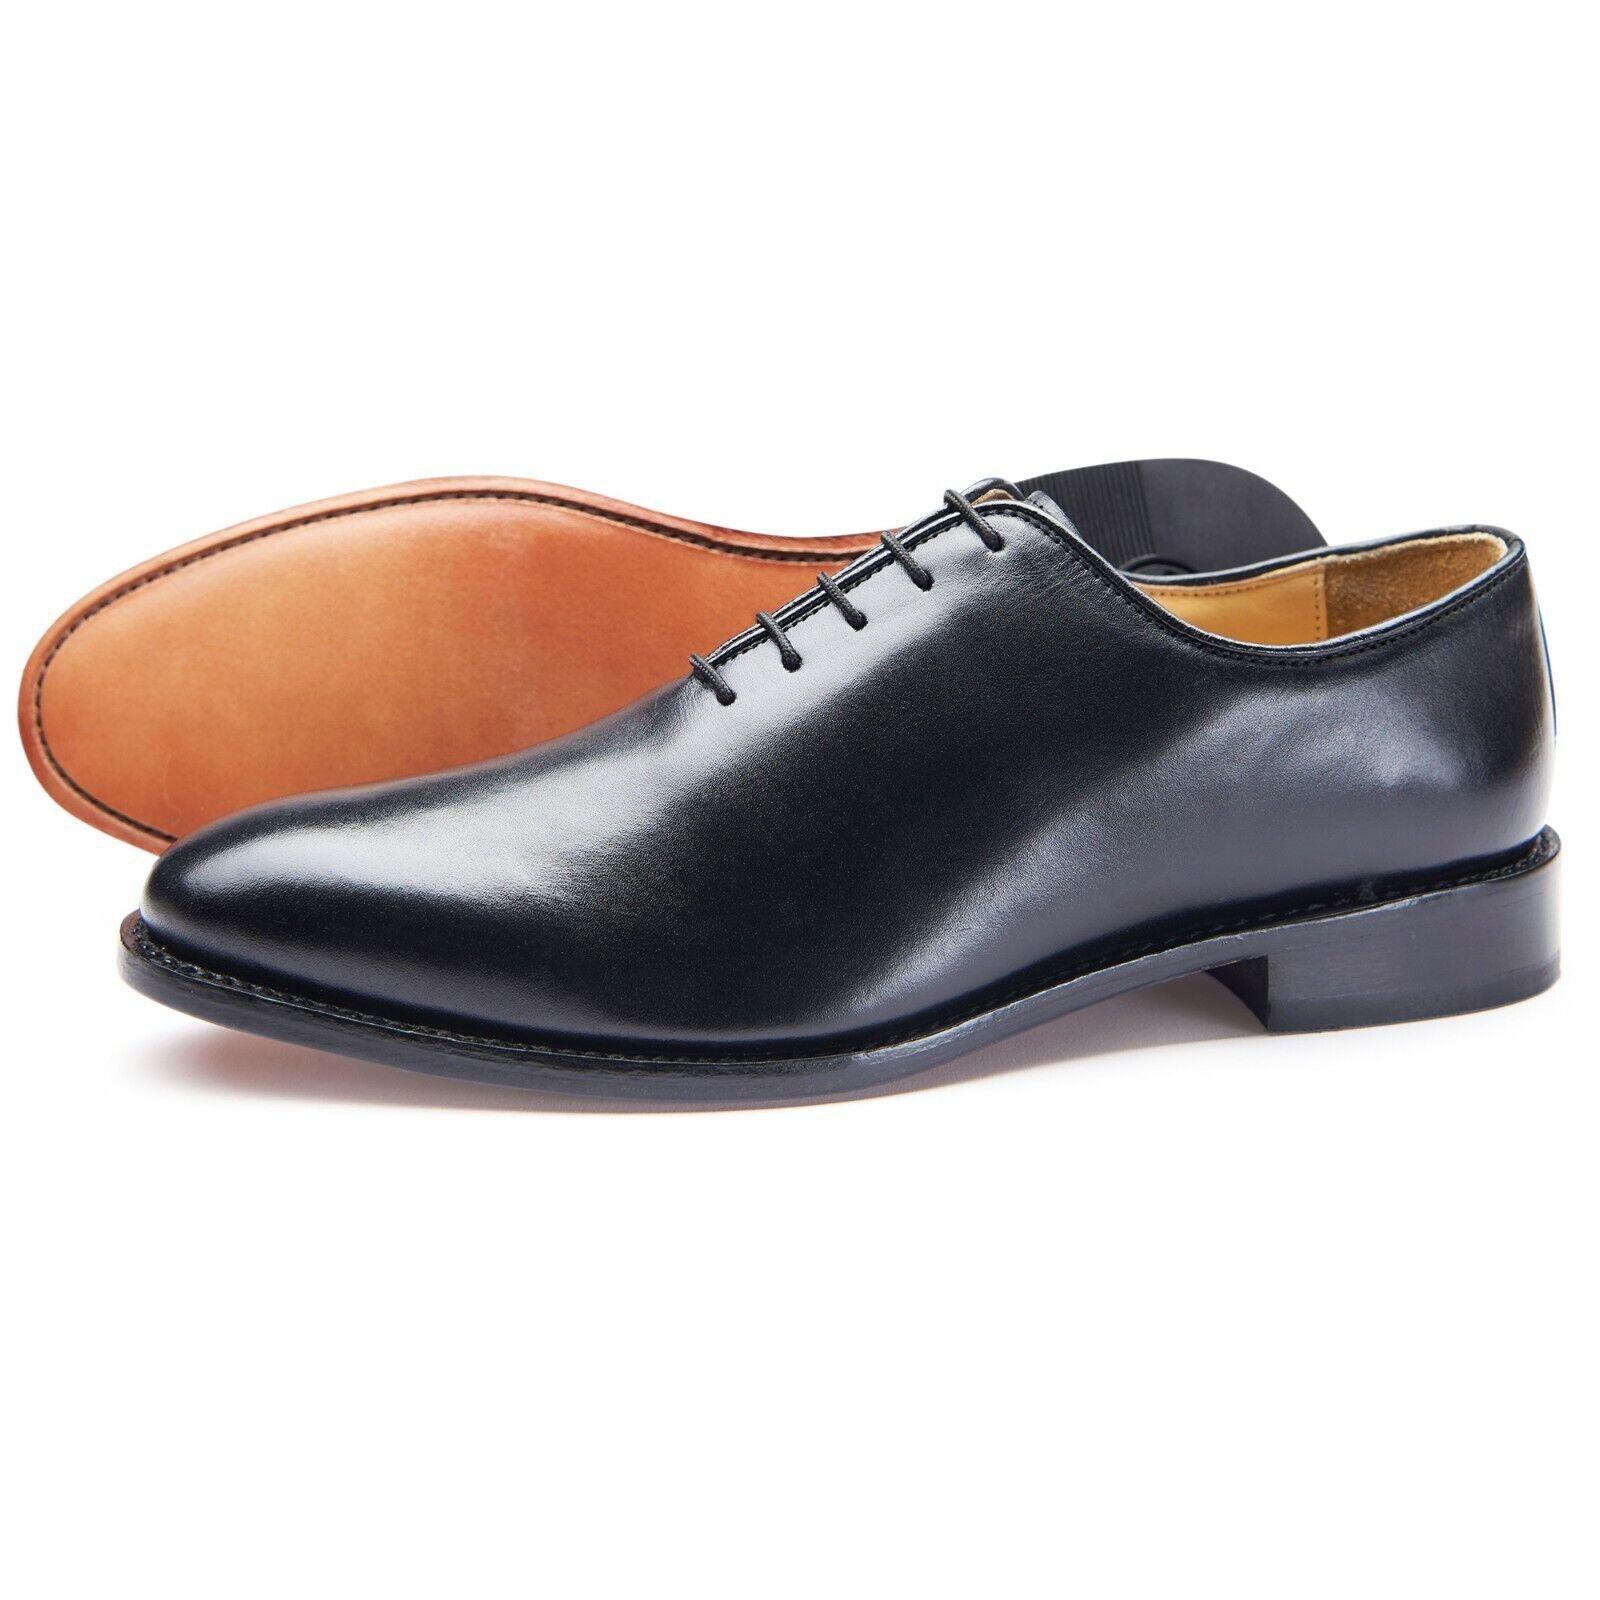 Prestige Oxford Dress Shoe Black UK